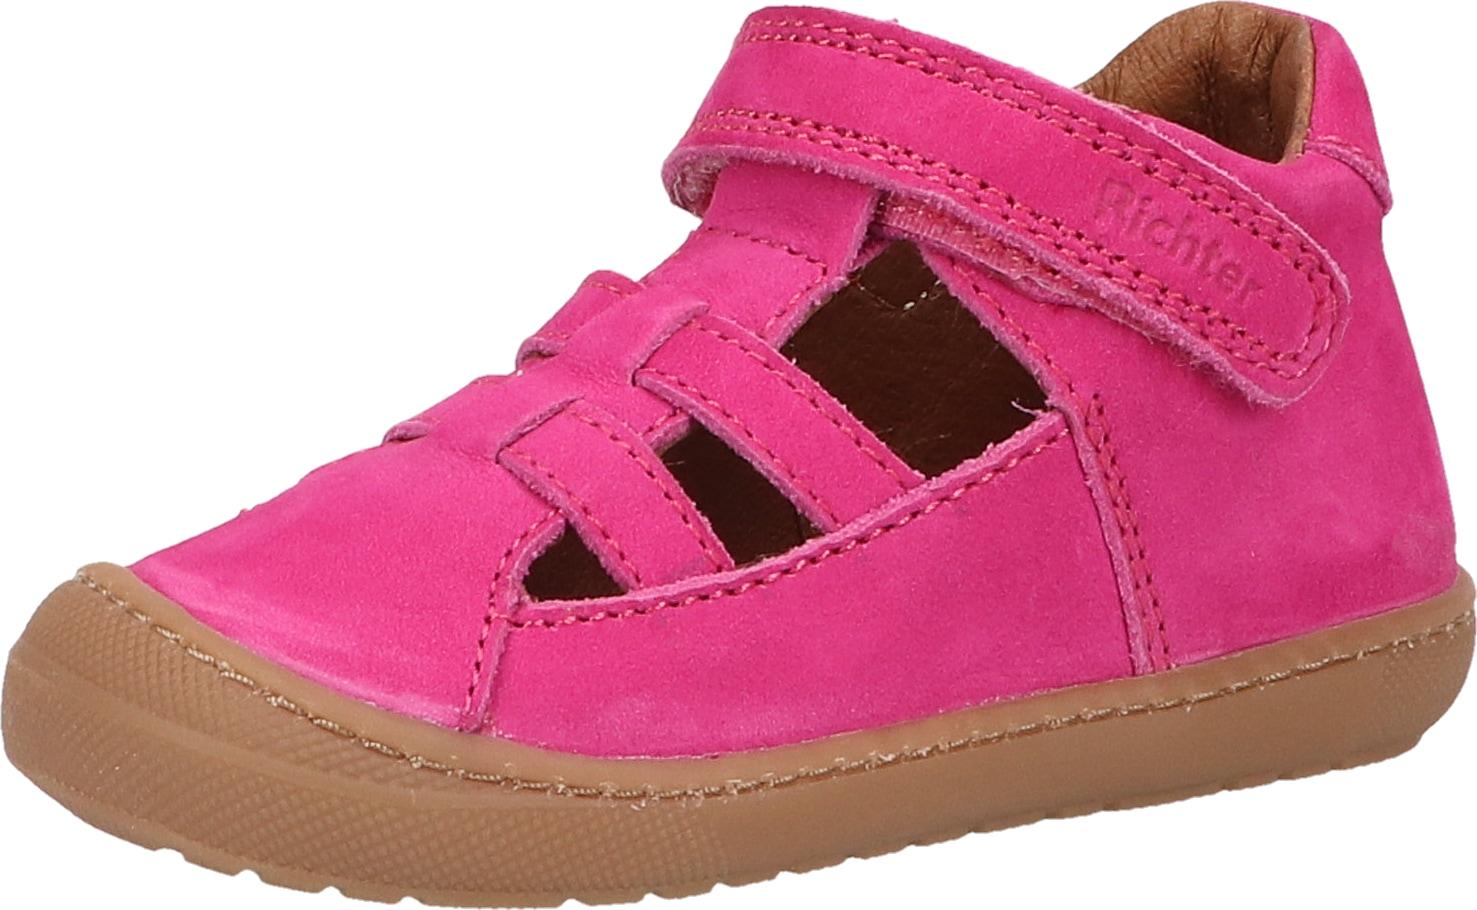 Richter Lauflernschuh Nubukleder rosa Kinder Lauflernschuhe Babyschuhe